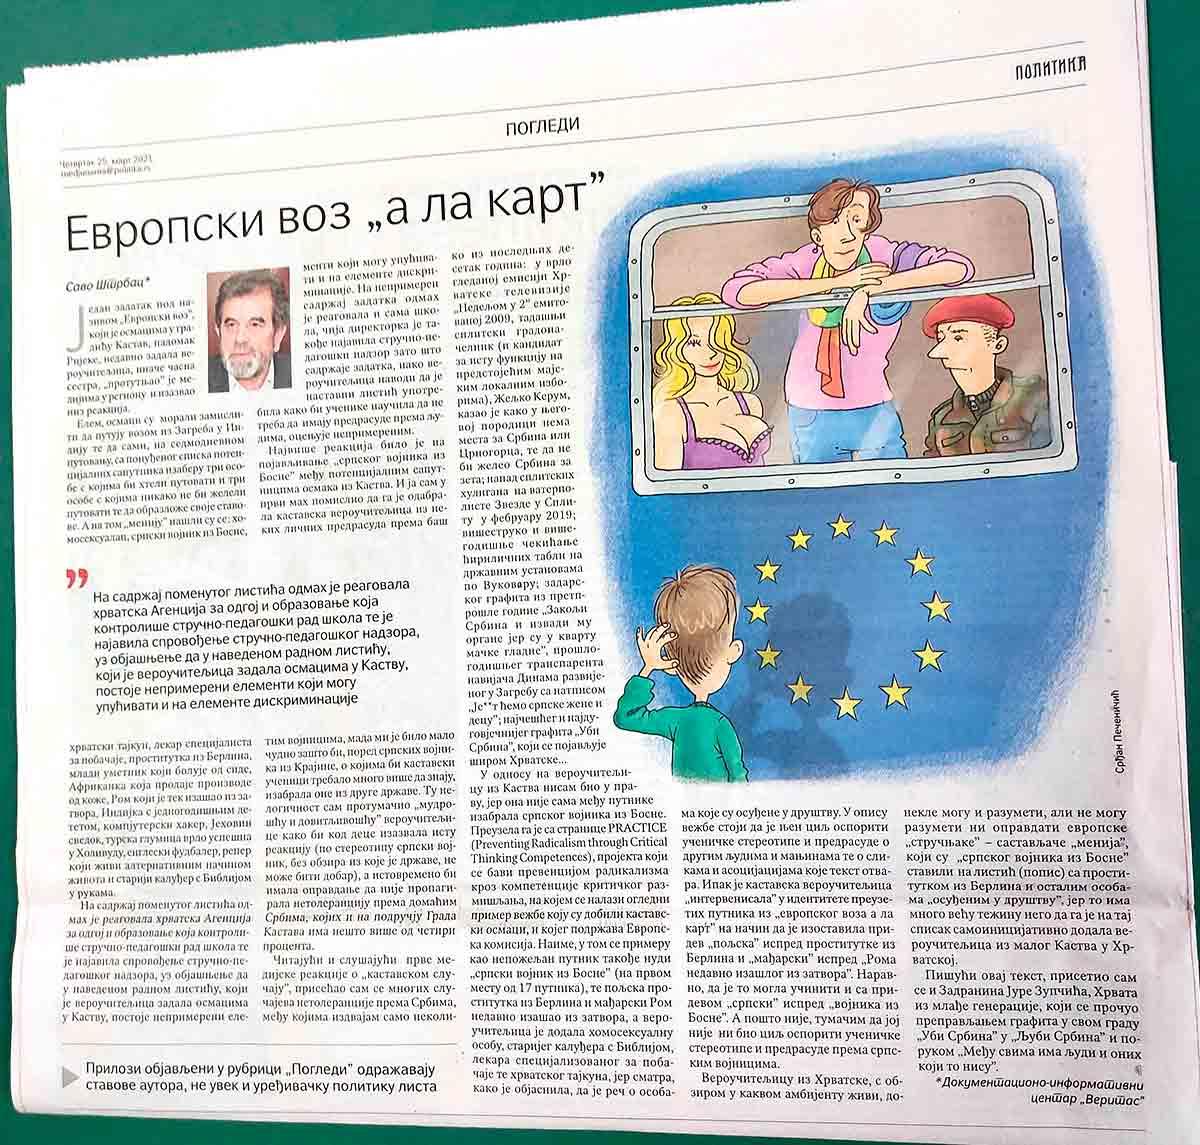 Politika, Savo Štrbac: Evropski voz a la kart, 25.3.2021. Foto: snimak stranice